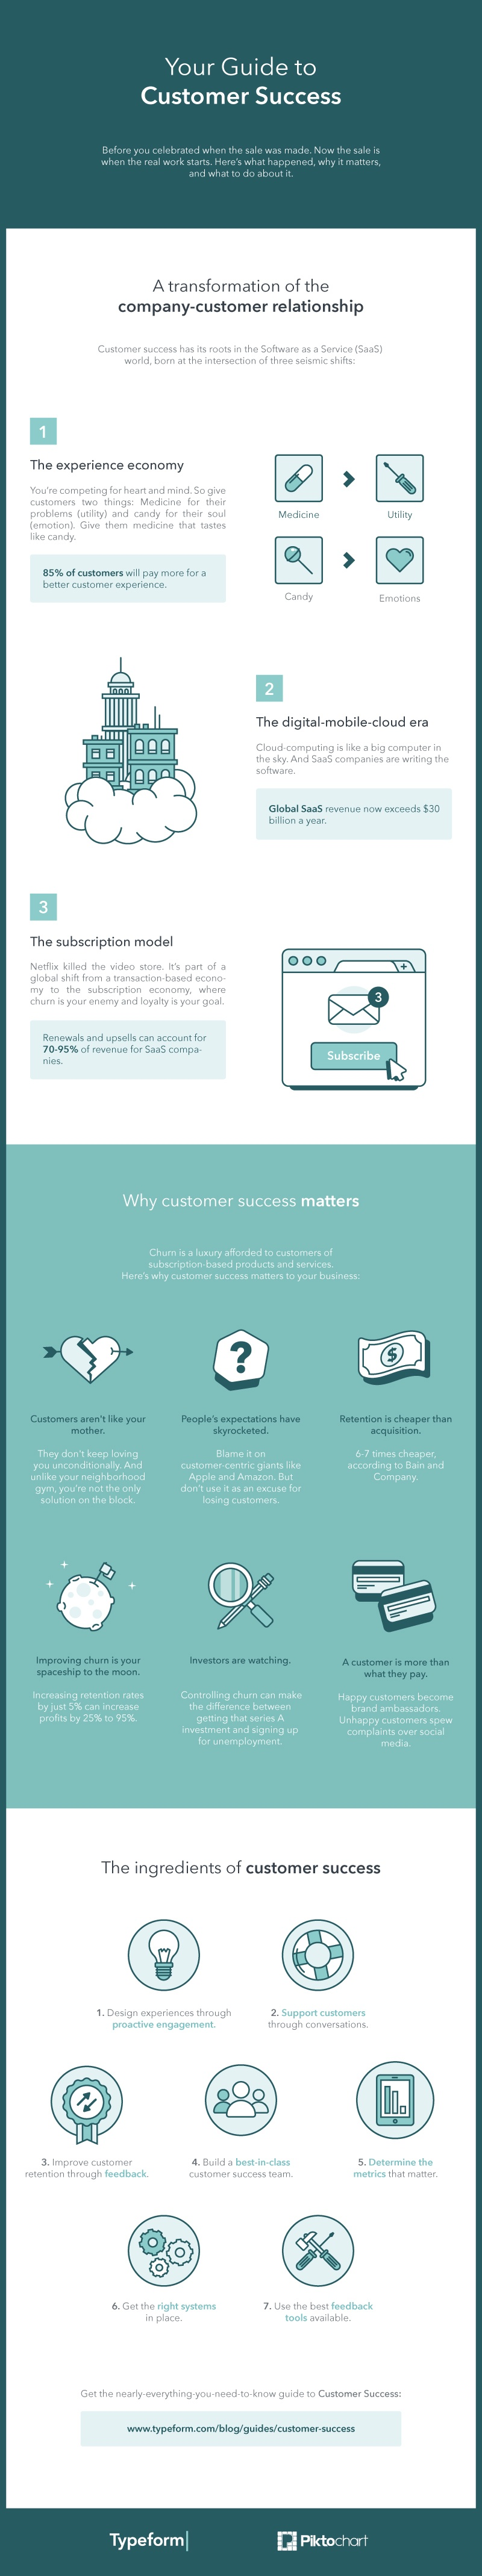 Typeform-Customer-Success-05